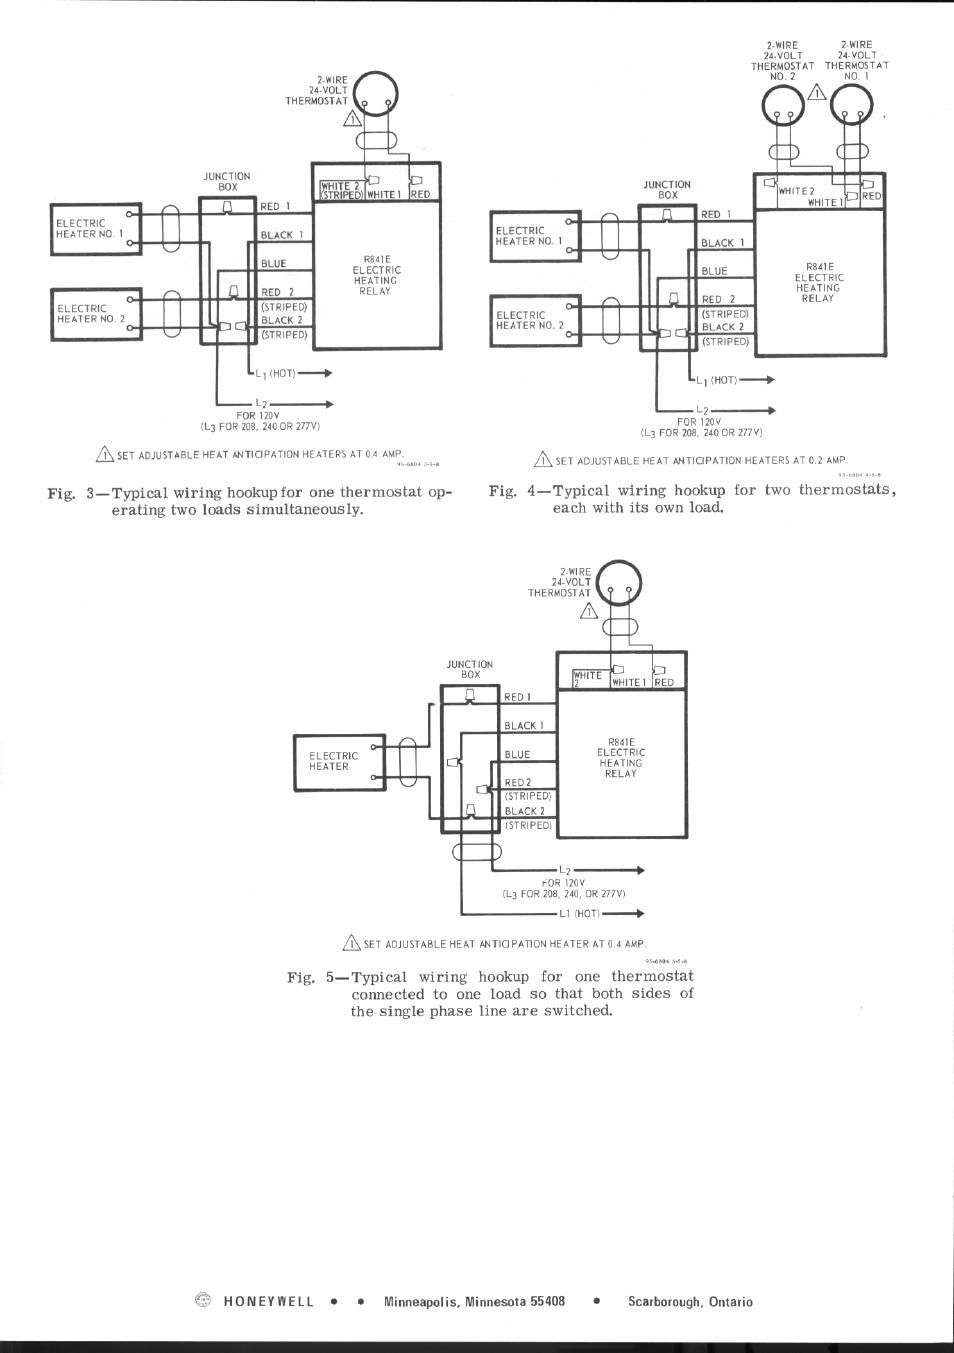 Honeywell R841e User Manual